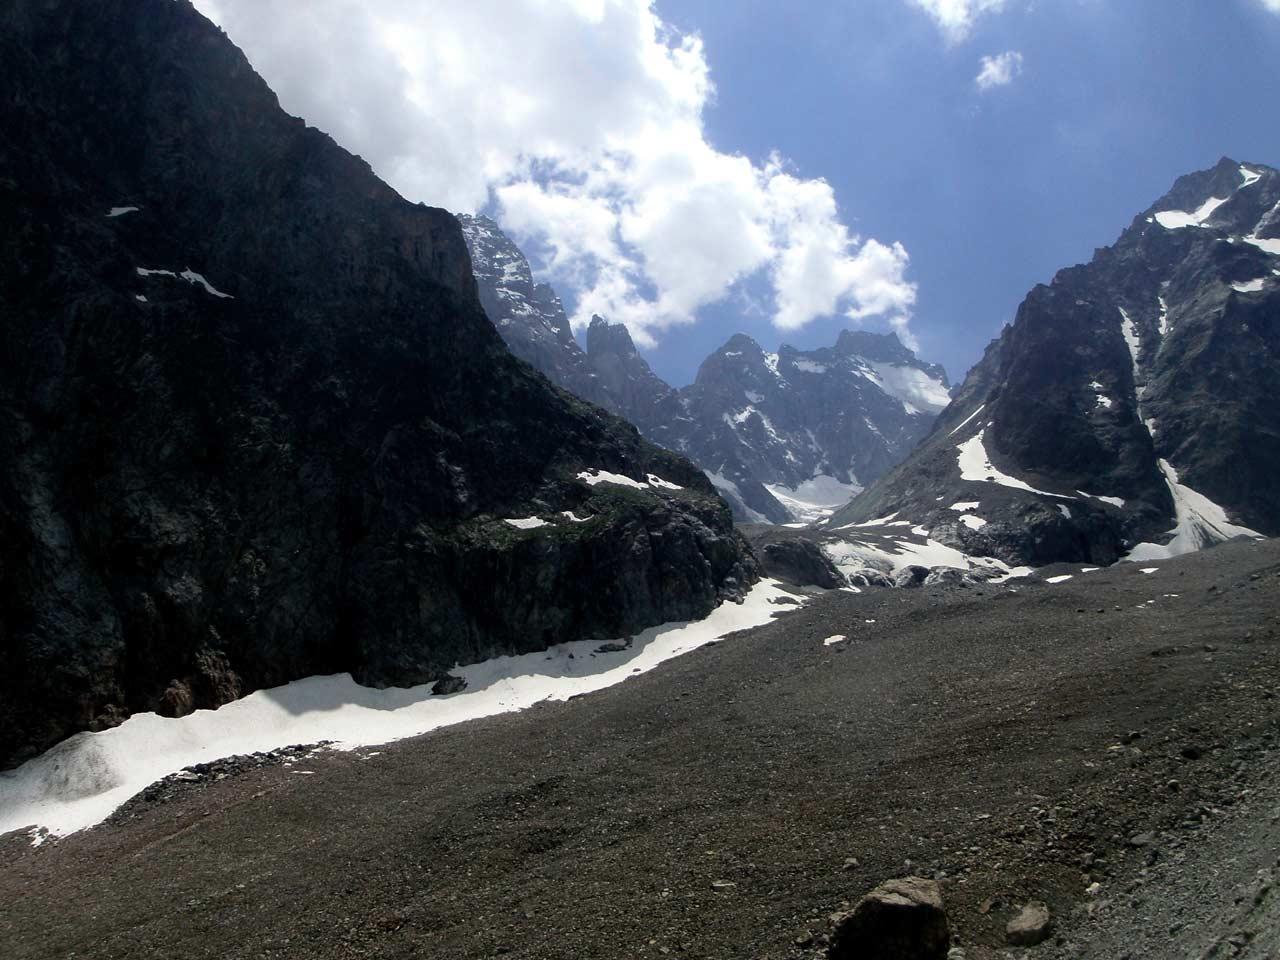 Le glacier noir